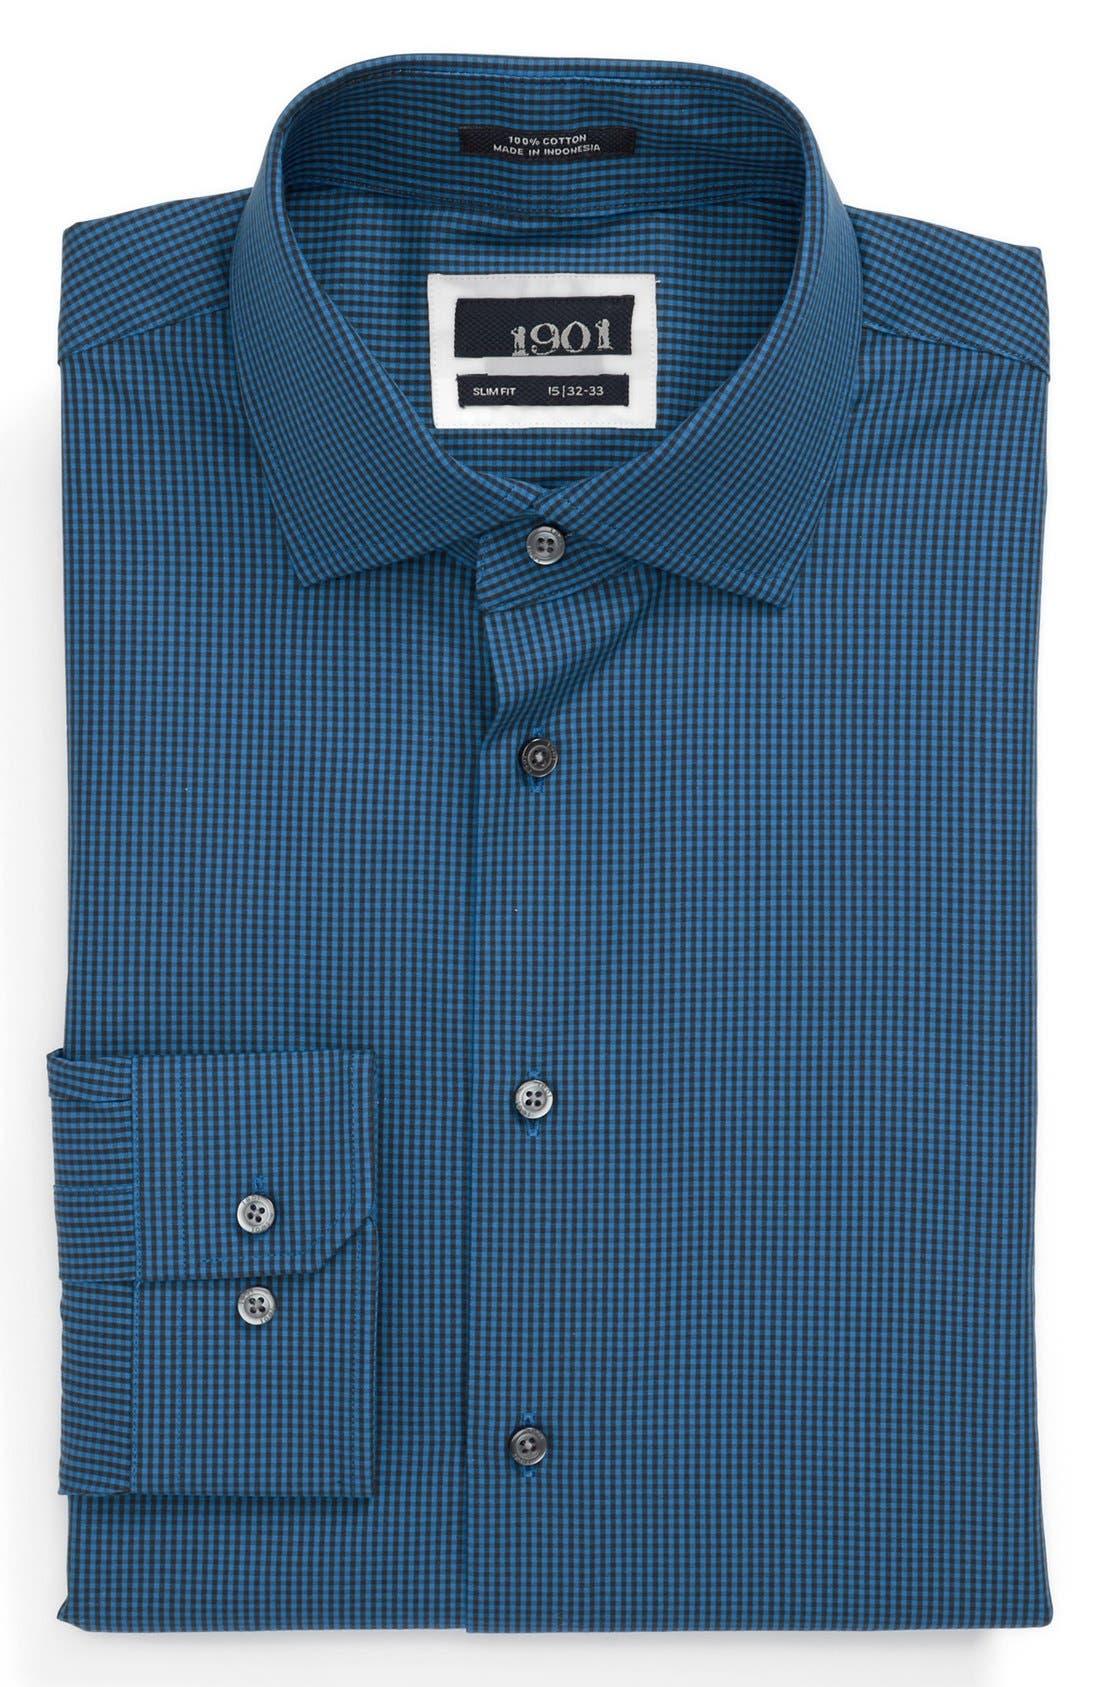 Alternate Image 1 Selected - 1901 Slim Fit Check Dress Shirt